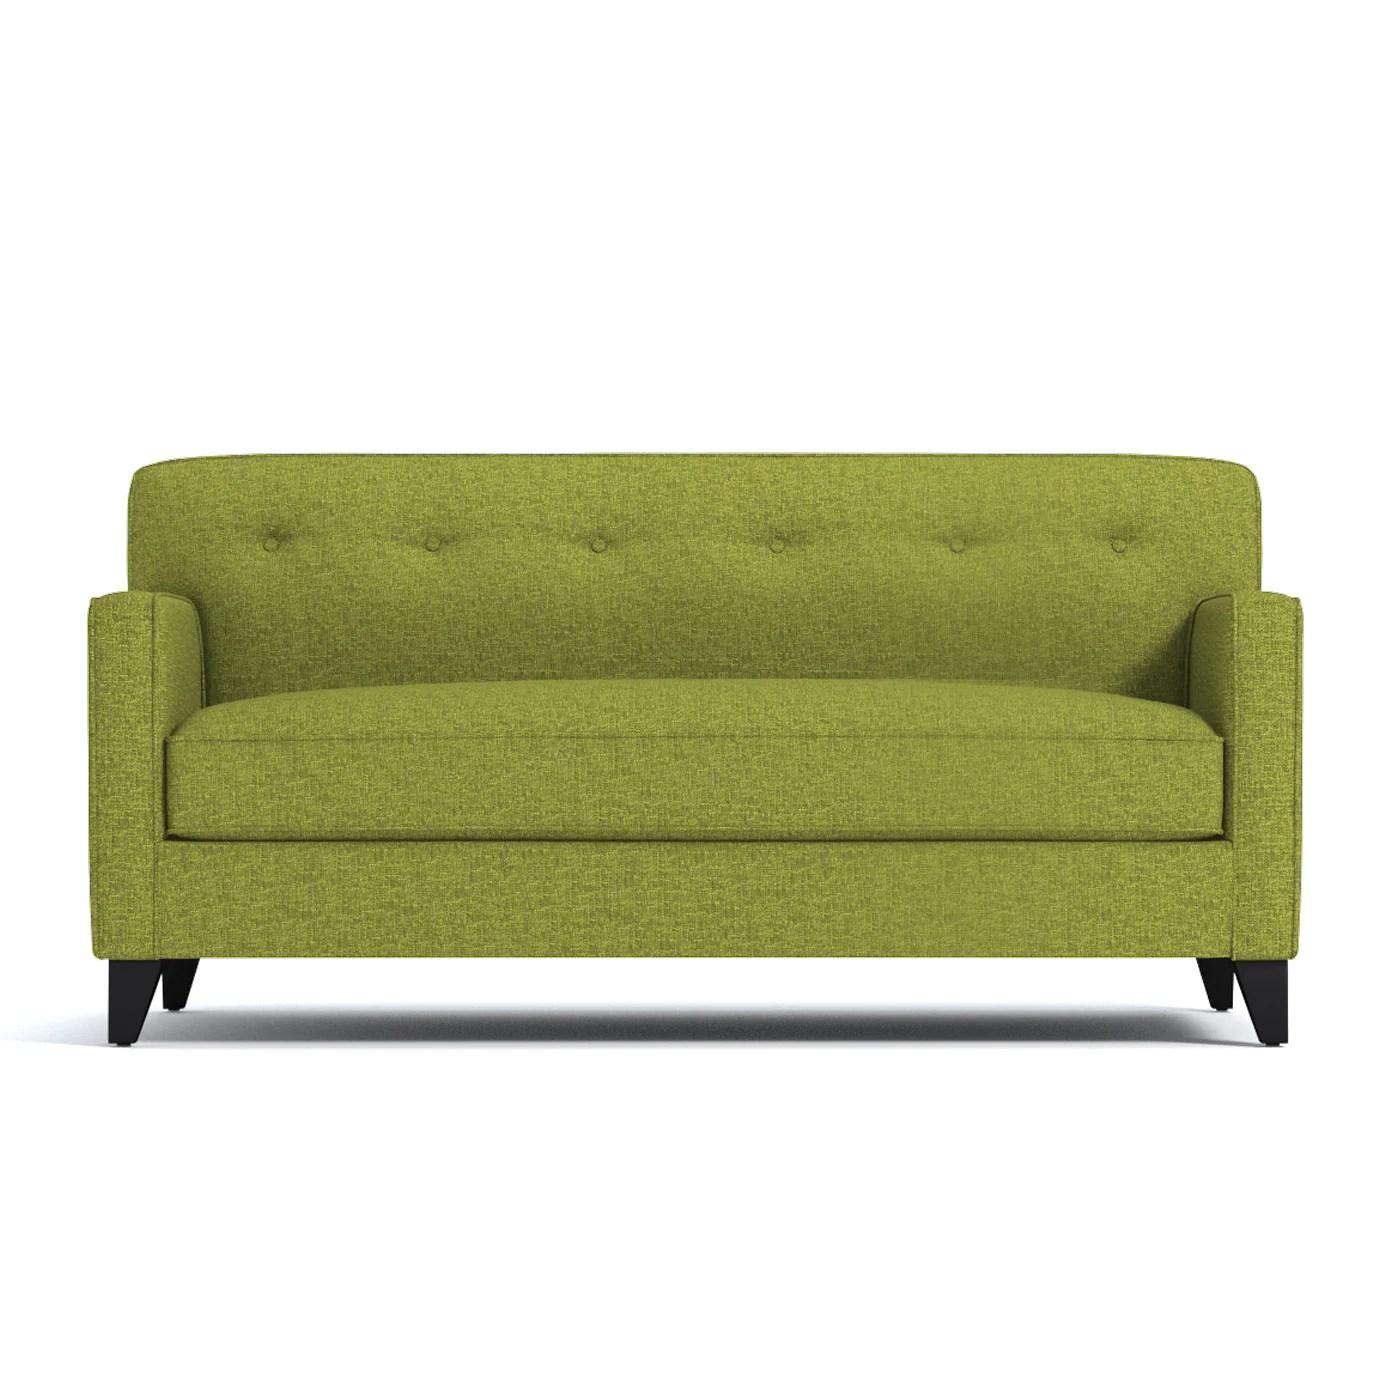 Harrison Apartment Size Sofa From Kyle Schuneman CHOICE OF FABRICS  Apt2B